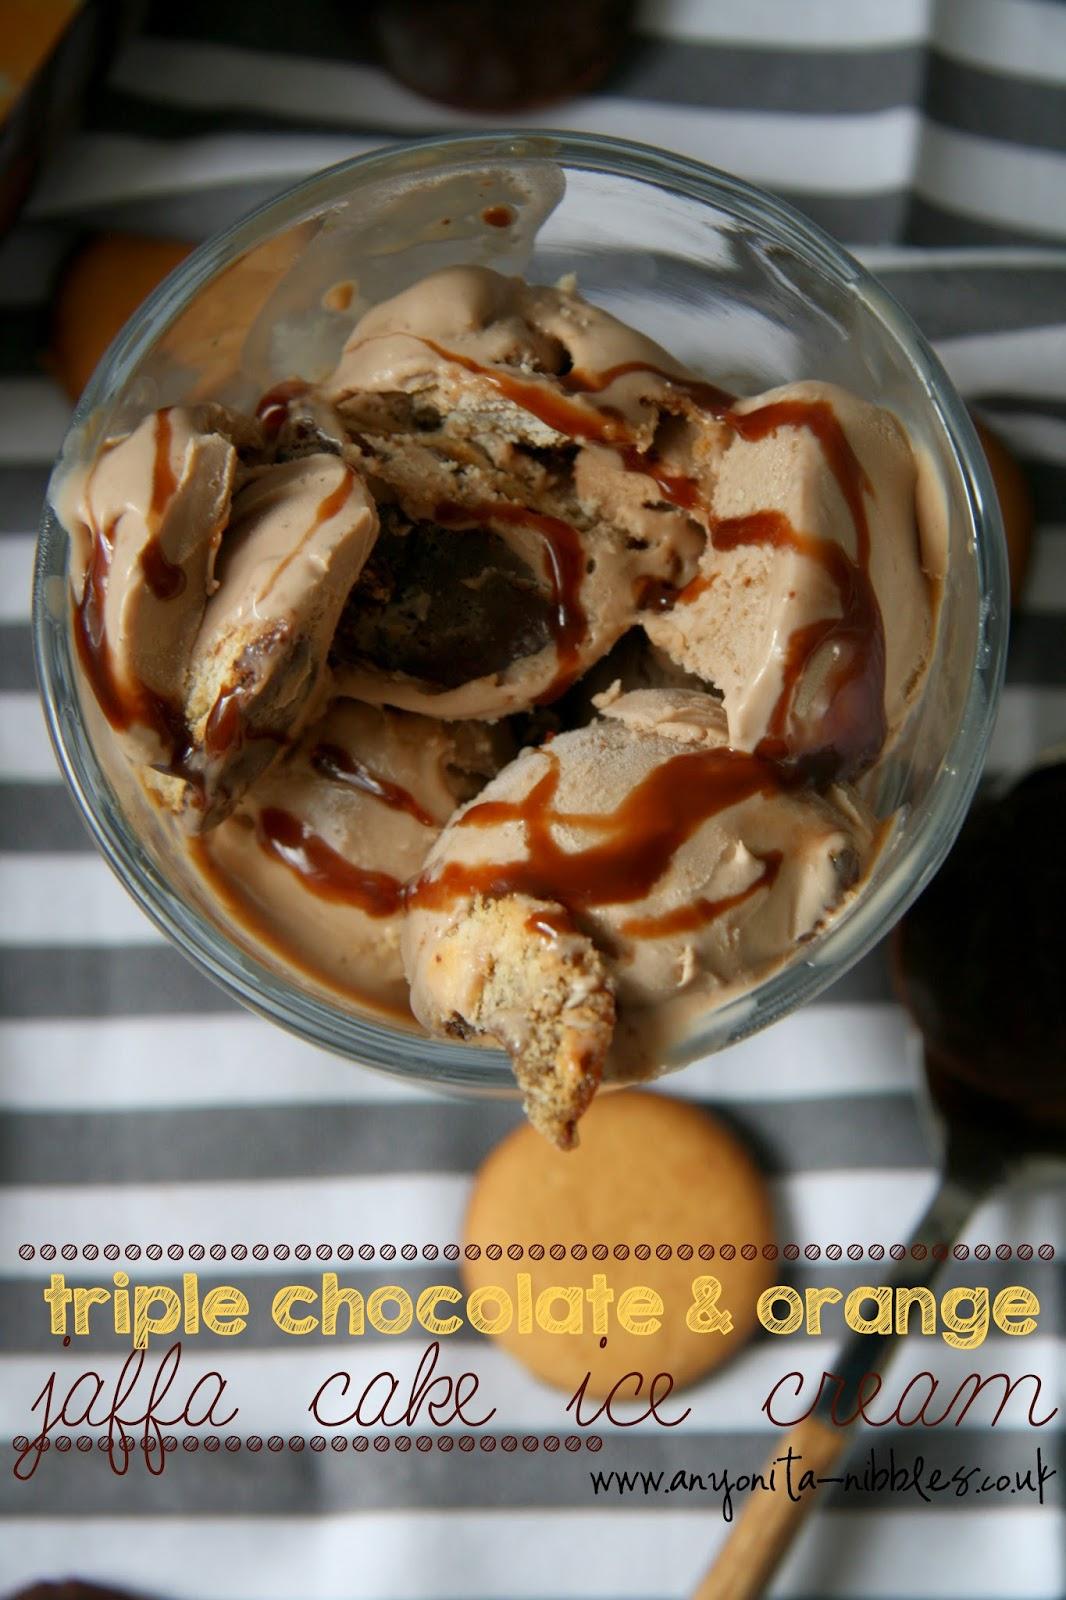 Triple chocolate & orange ice cream by Anyonita Nibbles